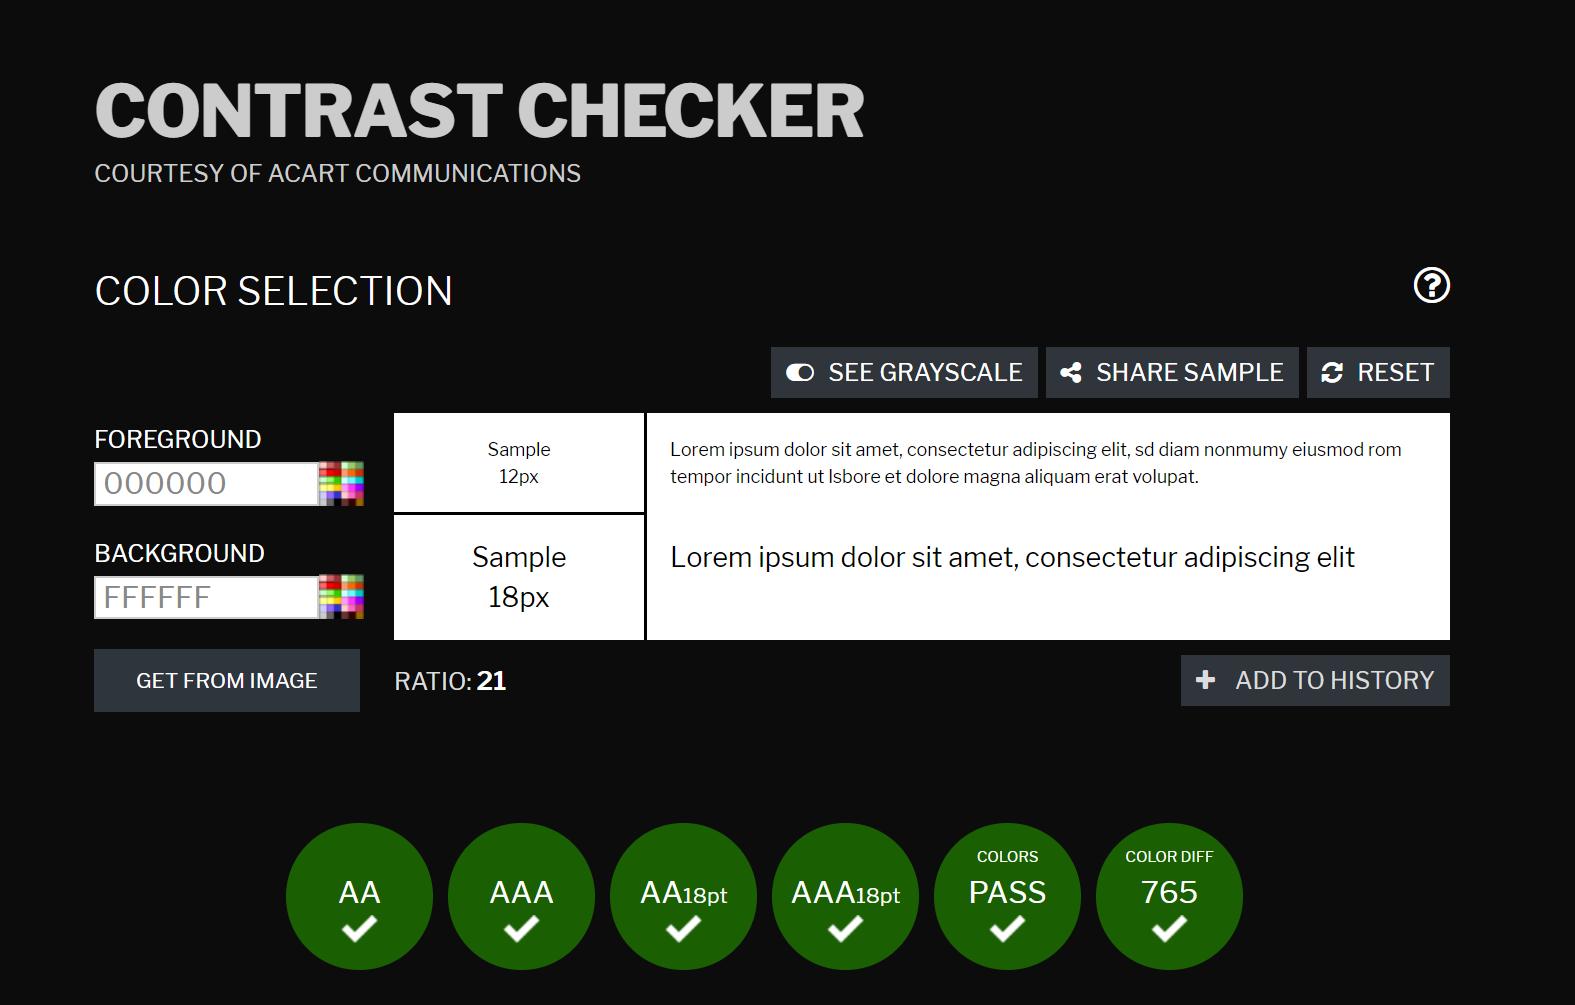 The user interface of contrastchecker.com